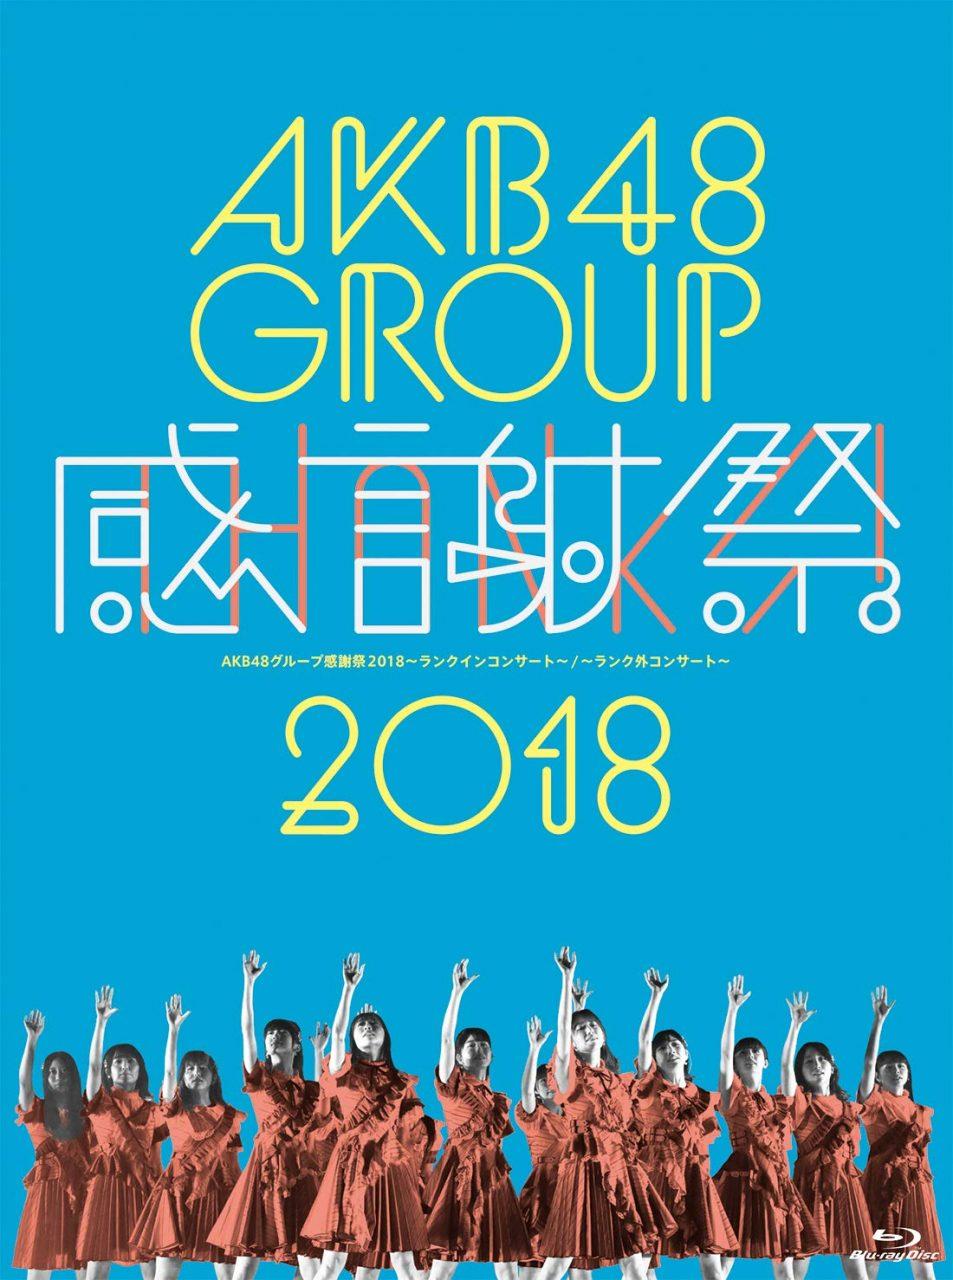 「AKB48グループ感謝祭2018 〜ランクインコンサート/ランク外コンサート〜」DVD&Blu-ray化! [1/9発売]